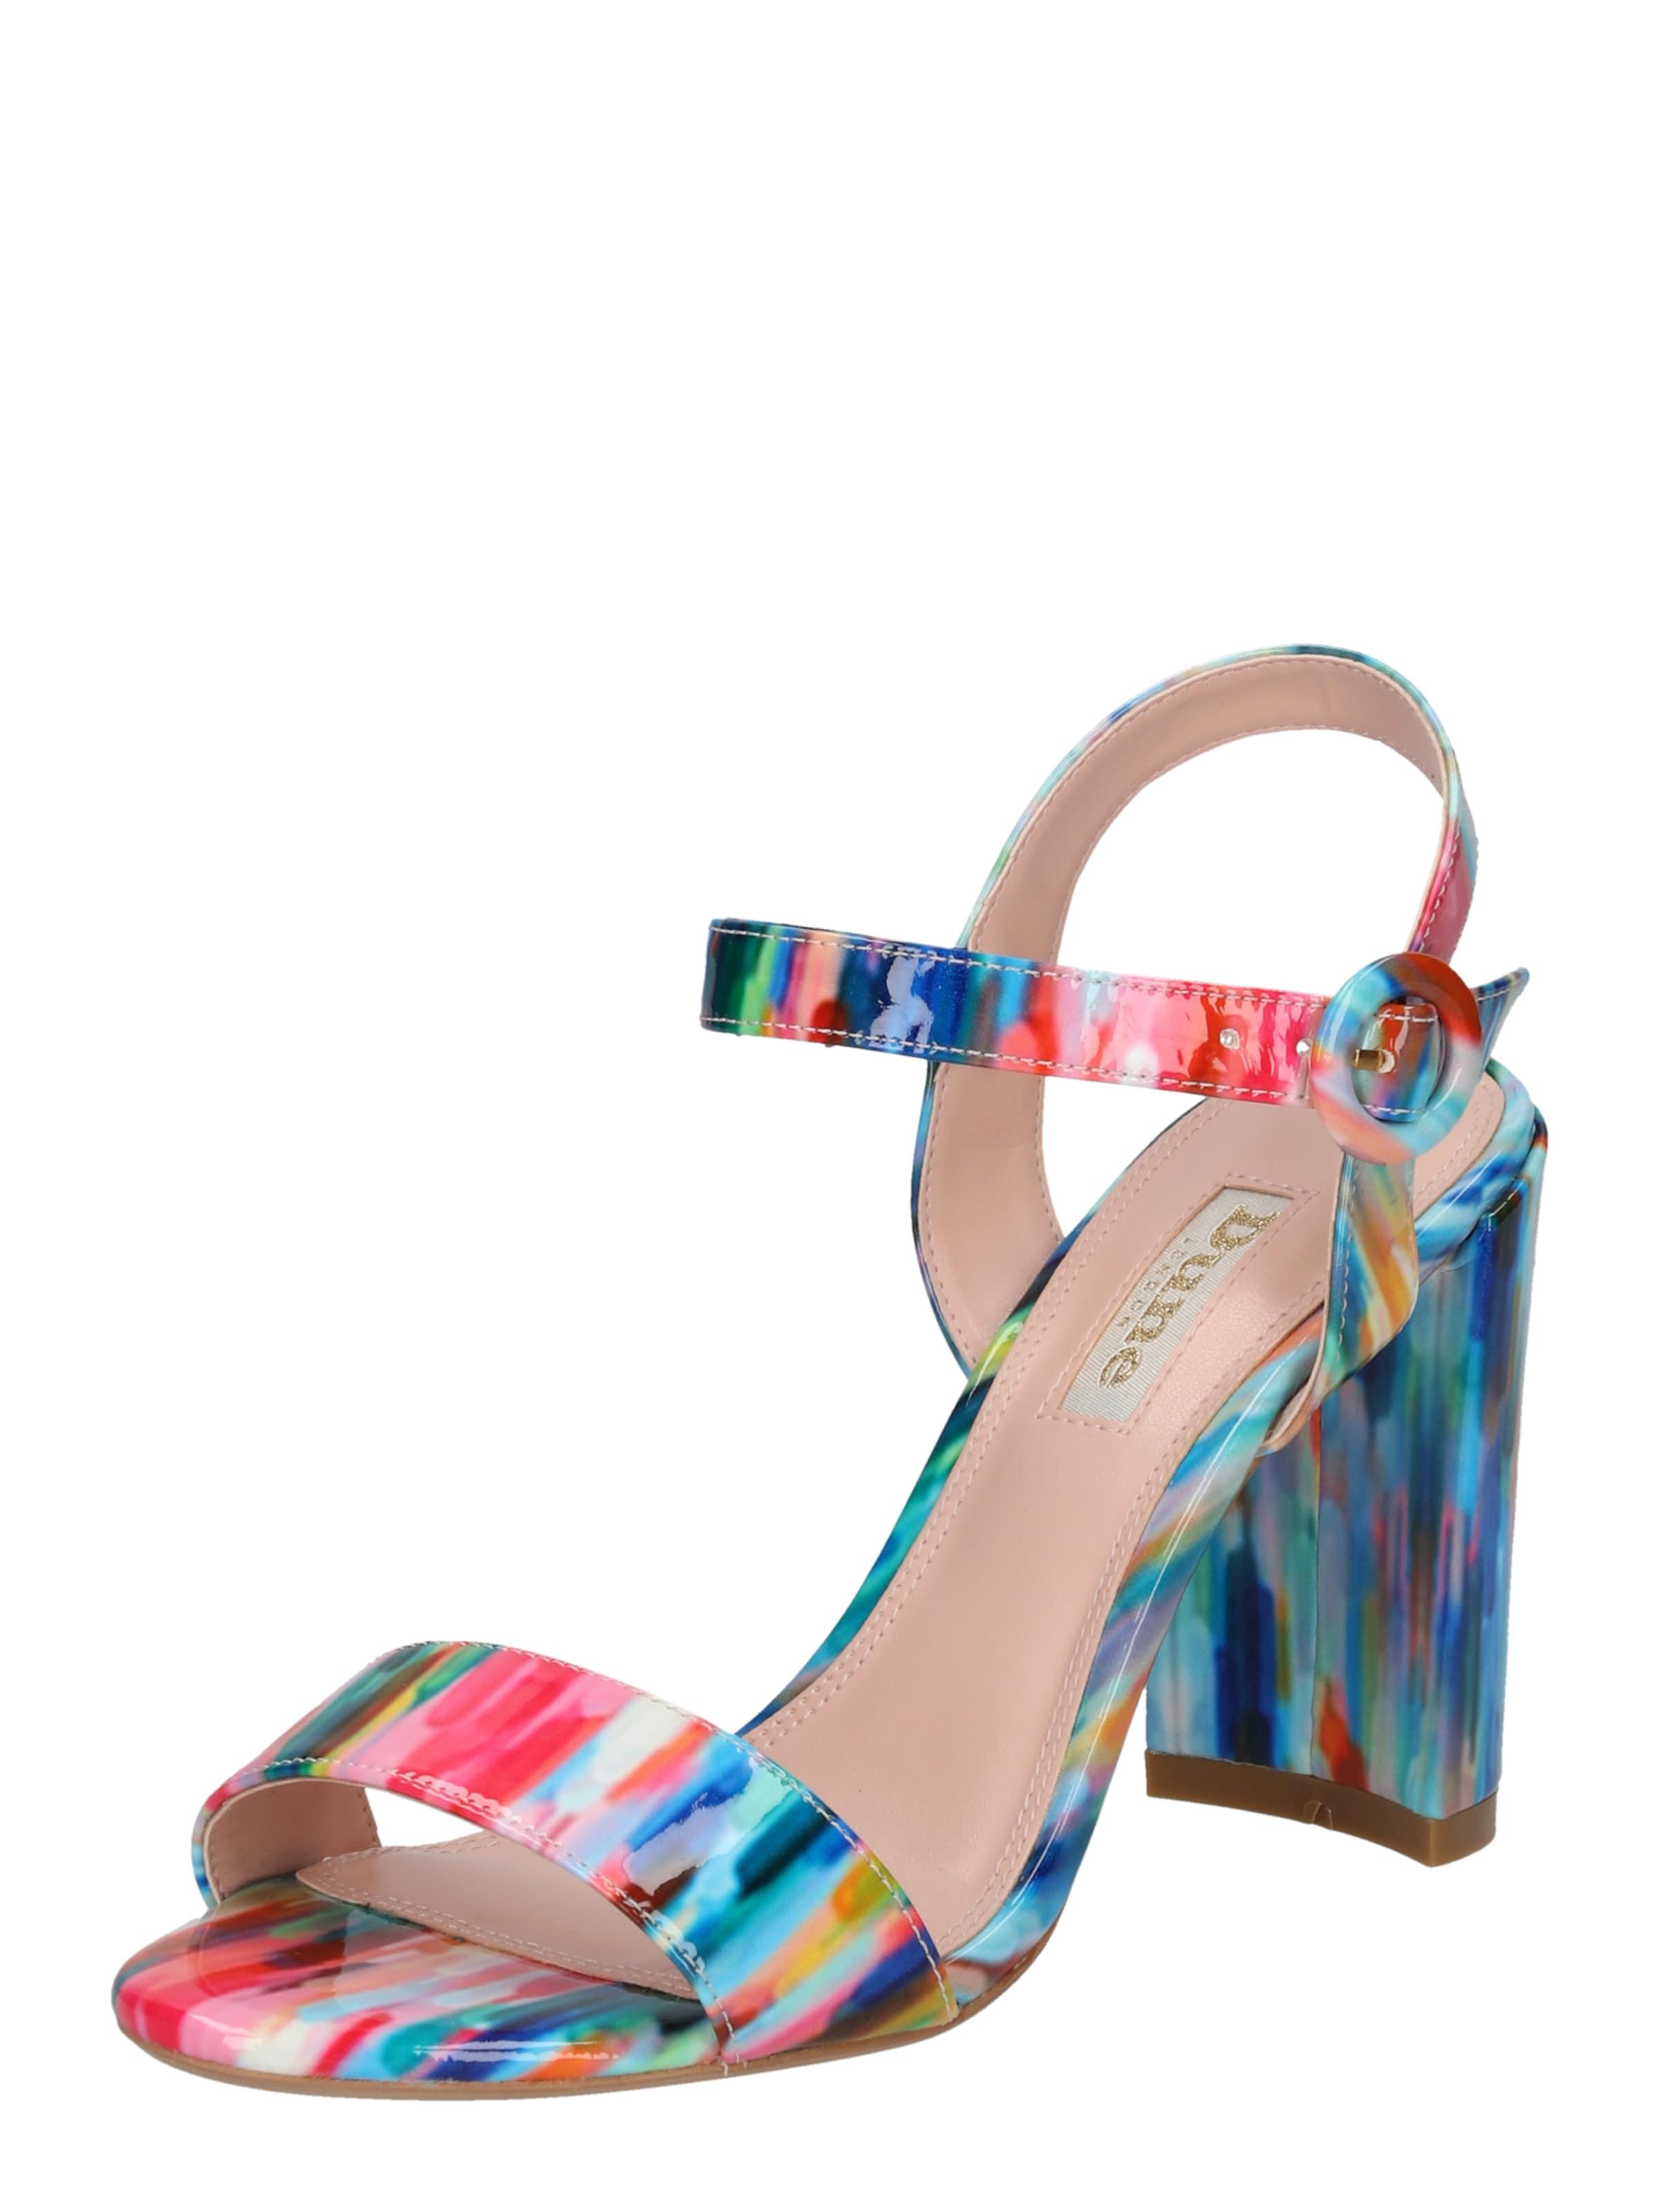 Dune LONDON Riemchensandalette MIXED Verschleißfeste billige Schuhe